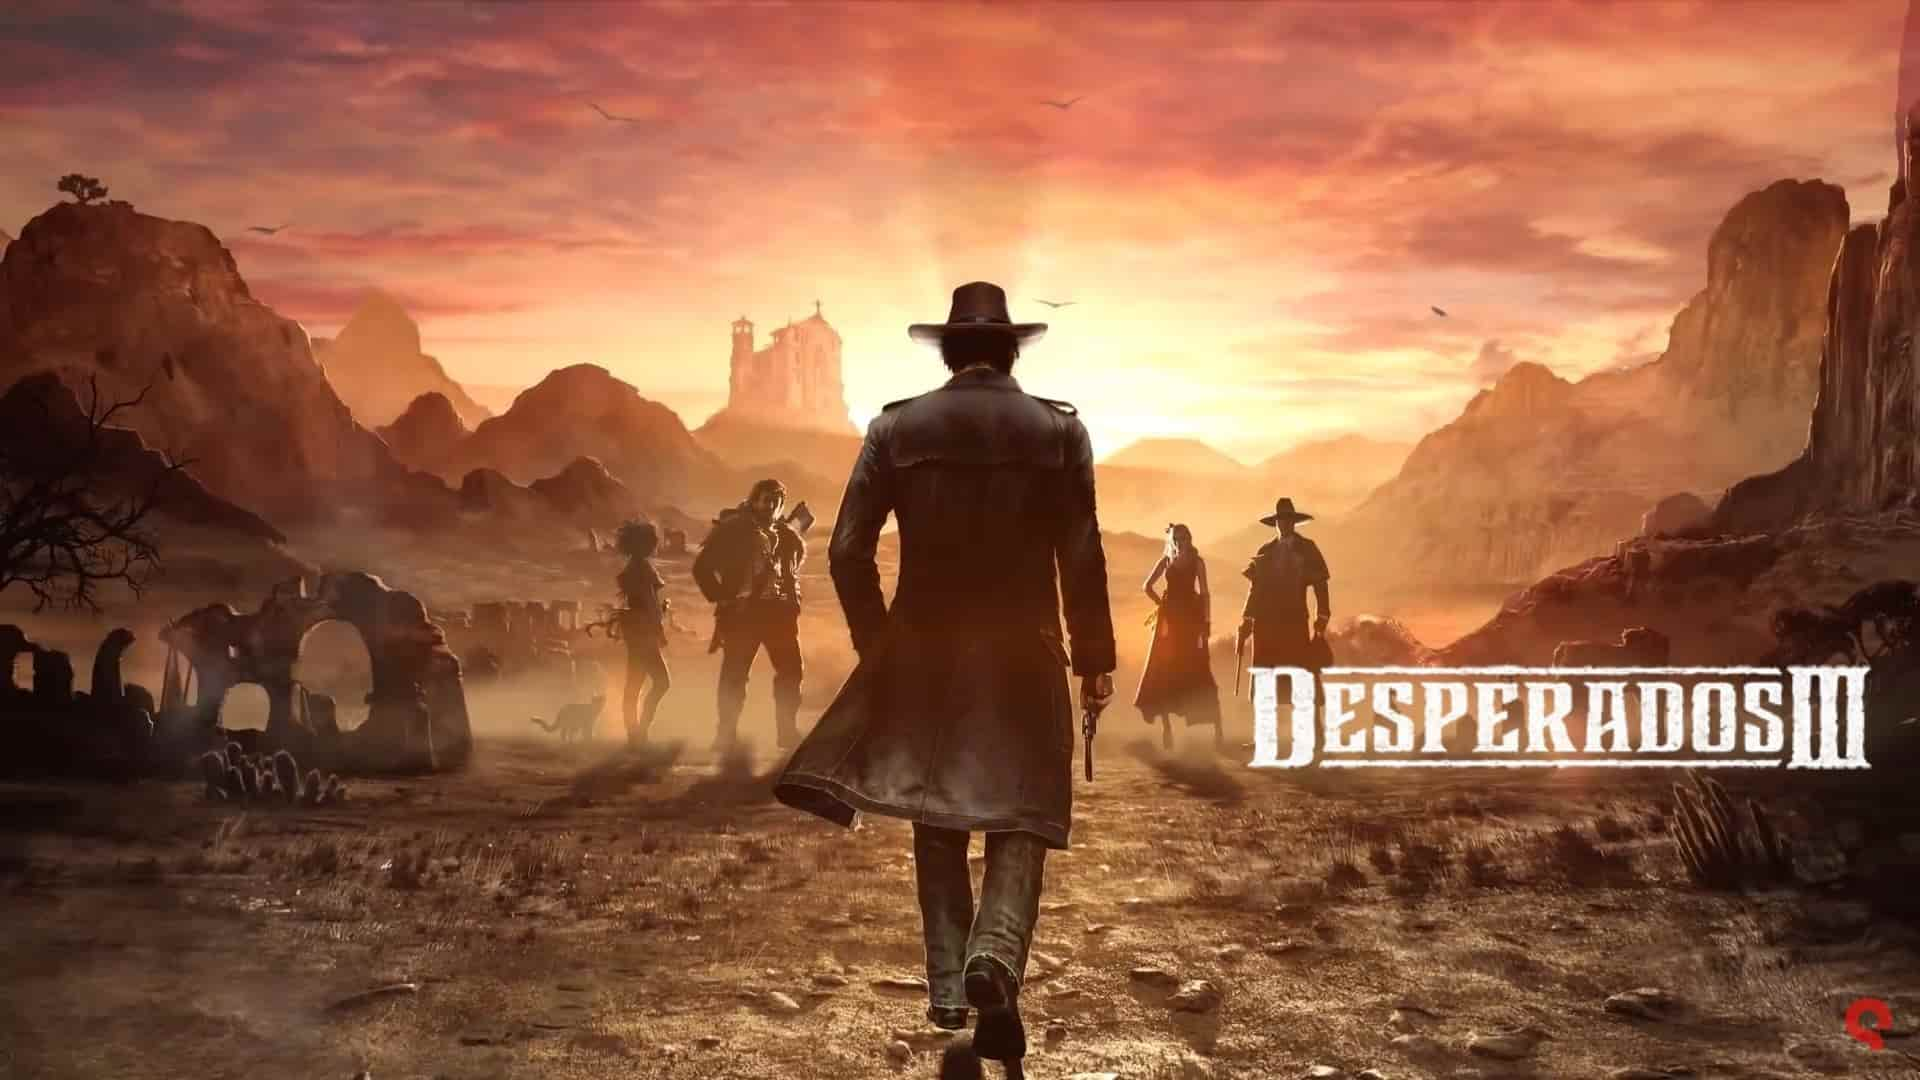 Review Desperados Iii Das High Noon Fur Echtzeit Strategen We Love Cereals And Video Games